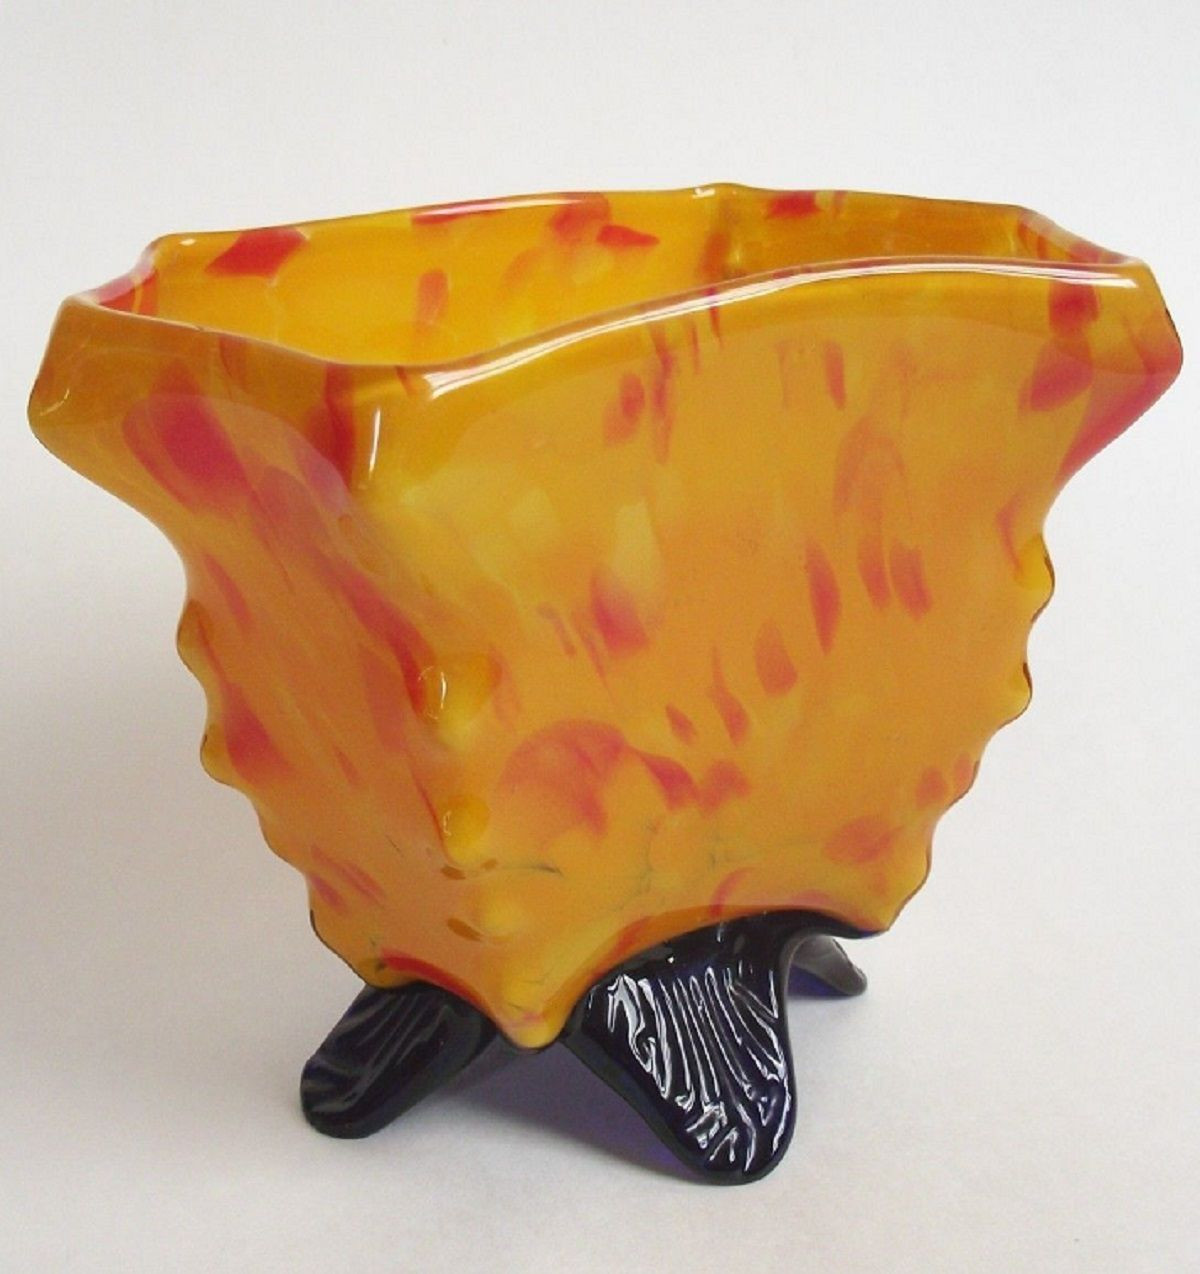 Kralik Glass Vase Of Kralik Bohemian Czech Art Deco Knuckle Spatter Glass Vase Red orange Throughout Kralik Bohemian Czech Art Deco Knuckle Spatter Glass Vase Red orange Blue Bowl